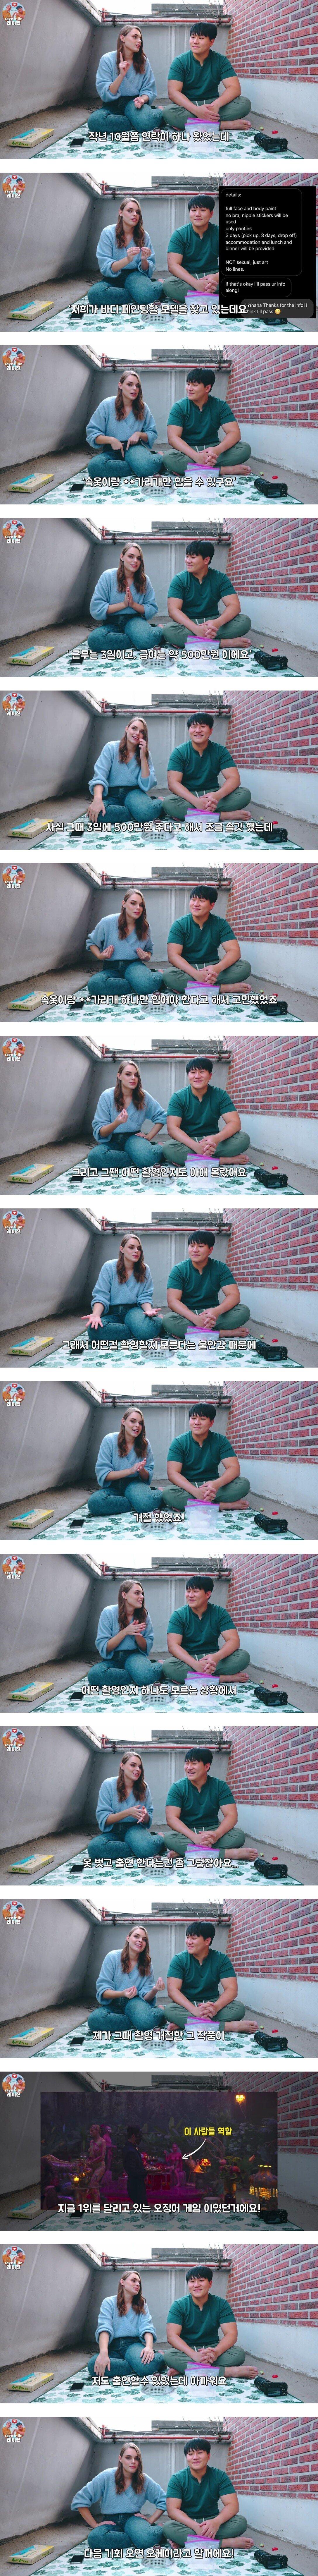 44.jpg 오징어게임) VIP뒤 바디페인팅 여자배우 섭외비용.jpg